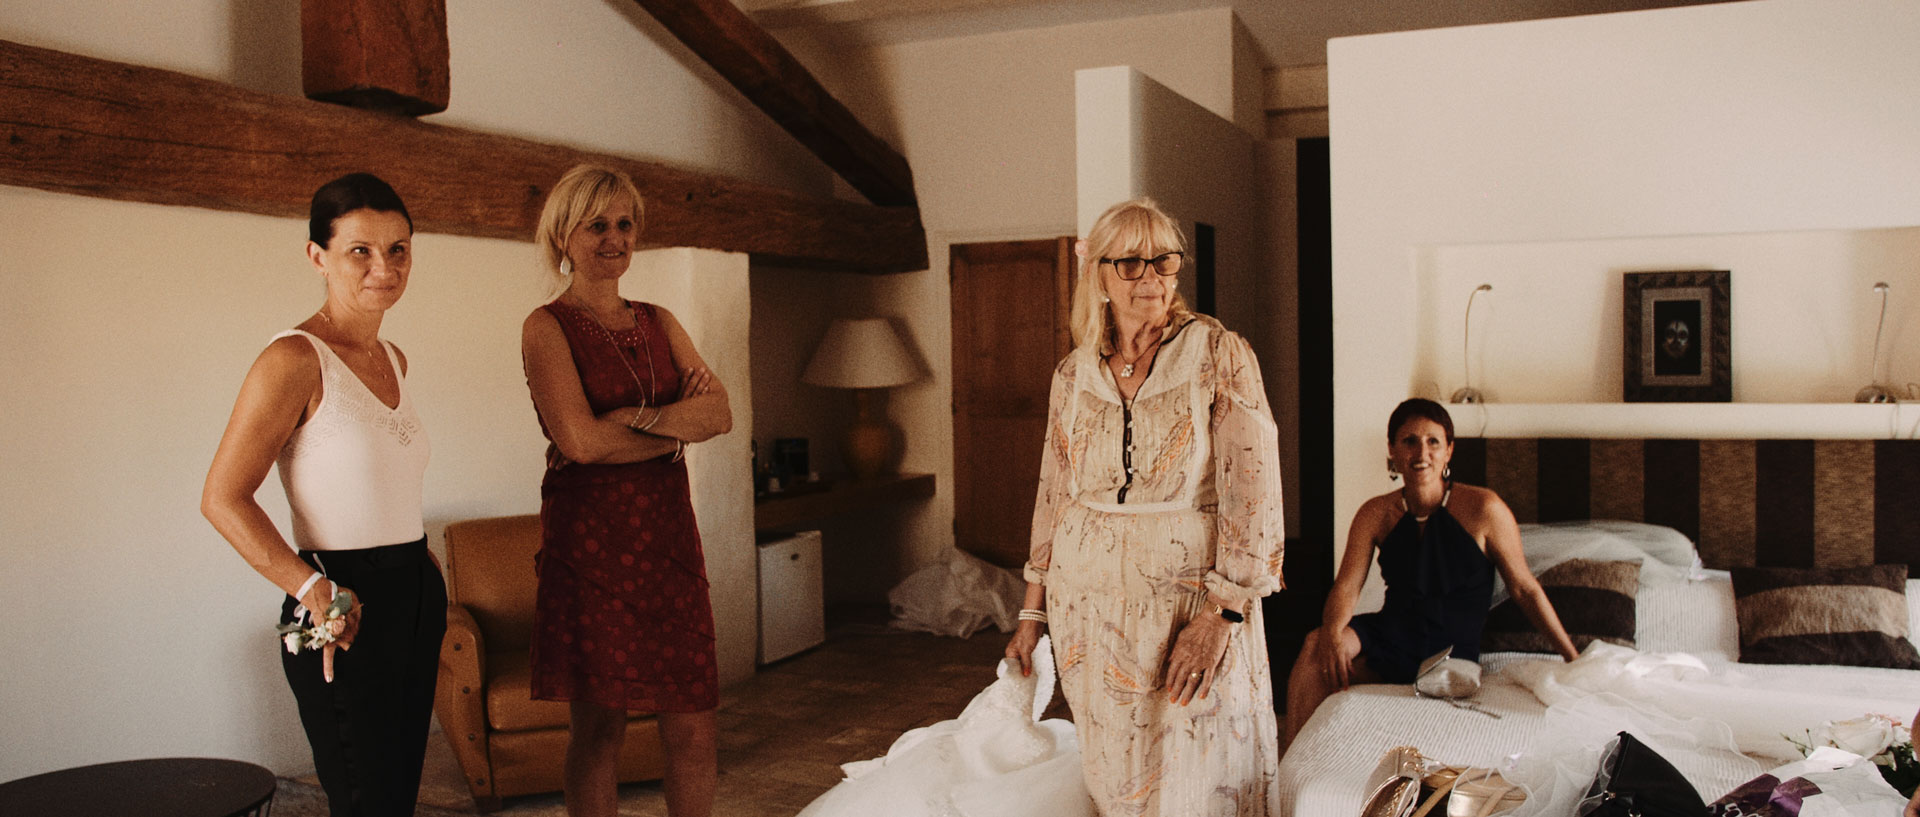 Delphine & Romulad Domaine Moures Bord de Mer Film Mariage (9).jpg